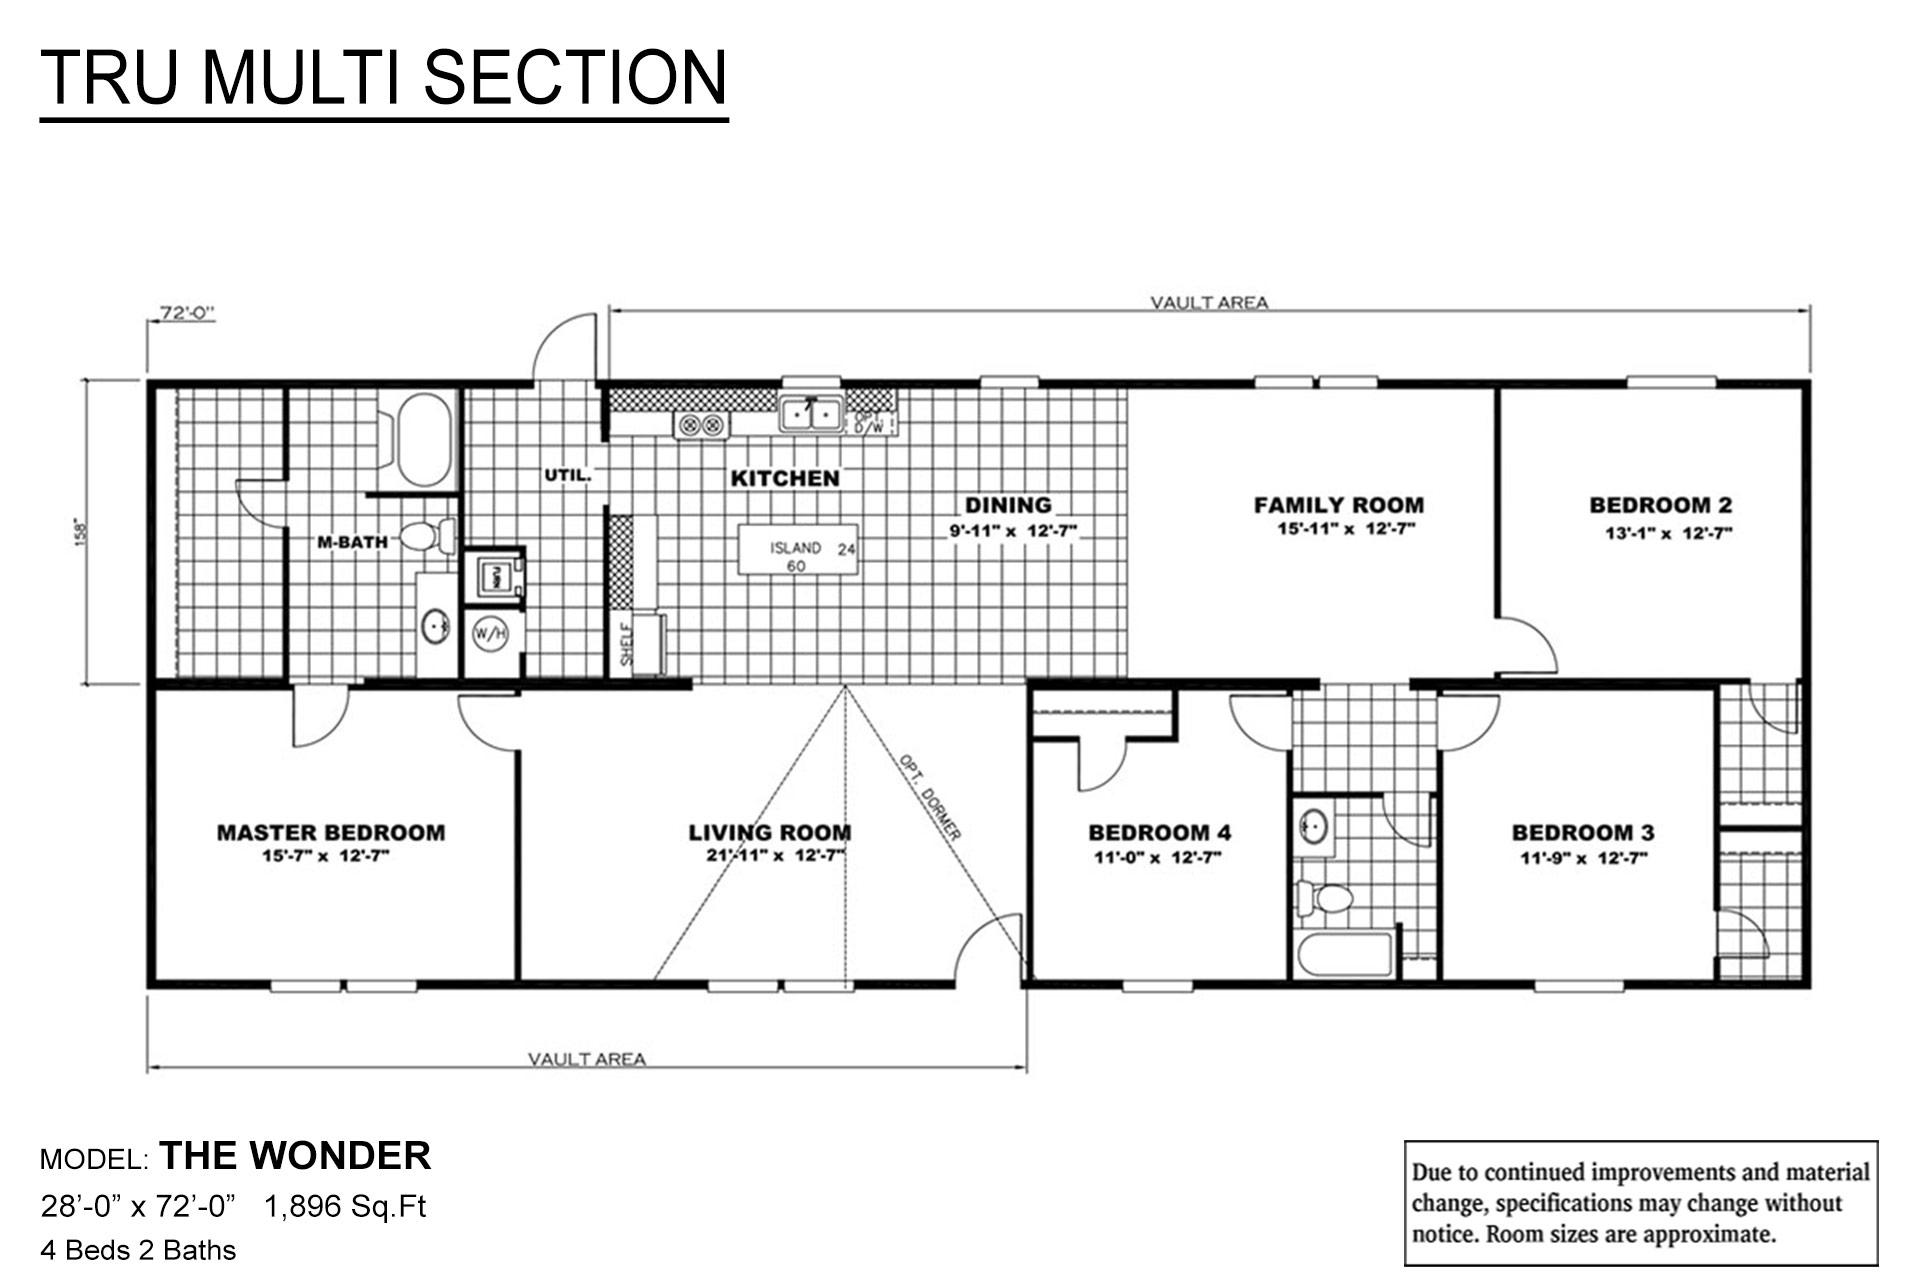 TRU Multi Section Wonder Layout